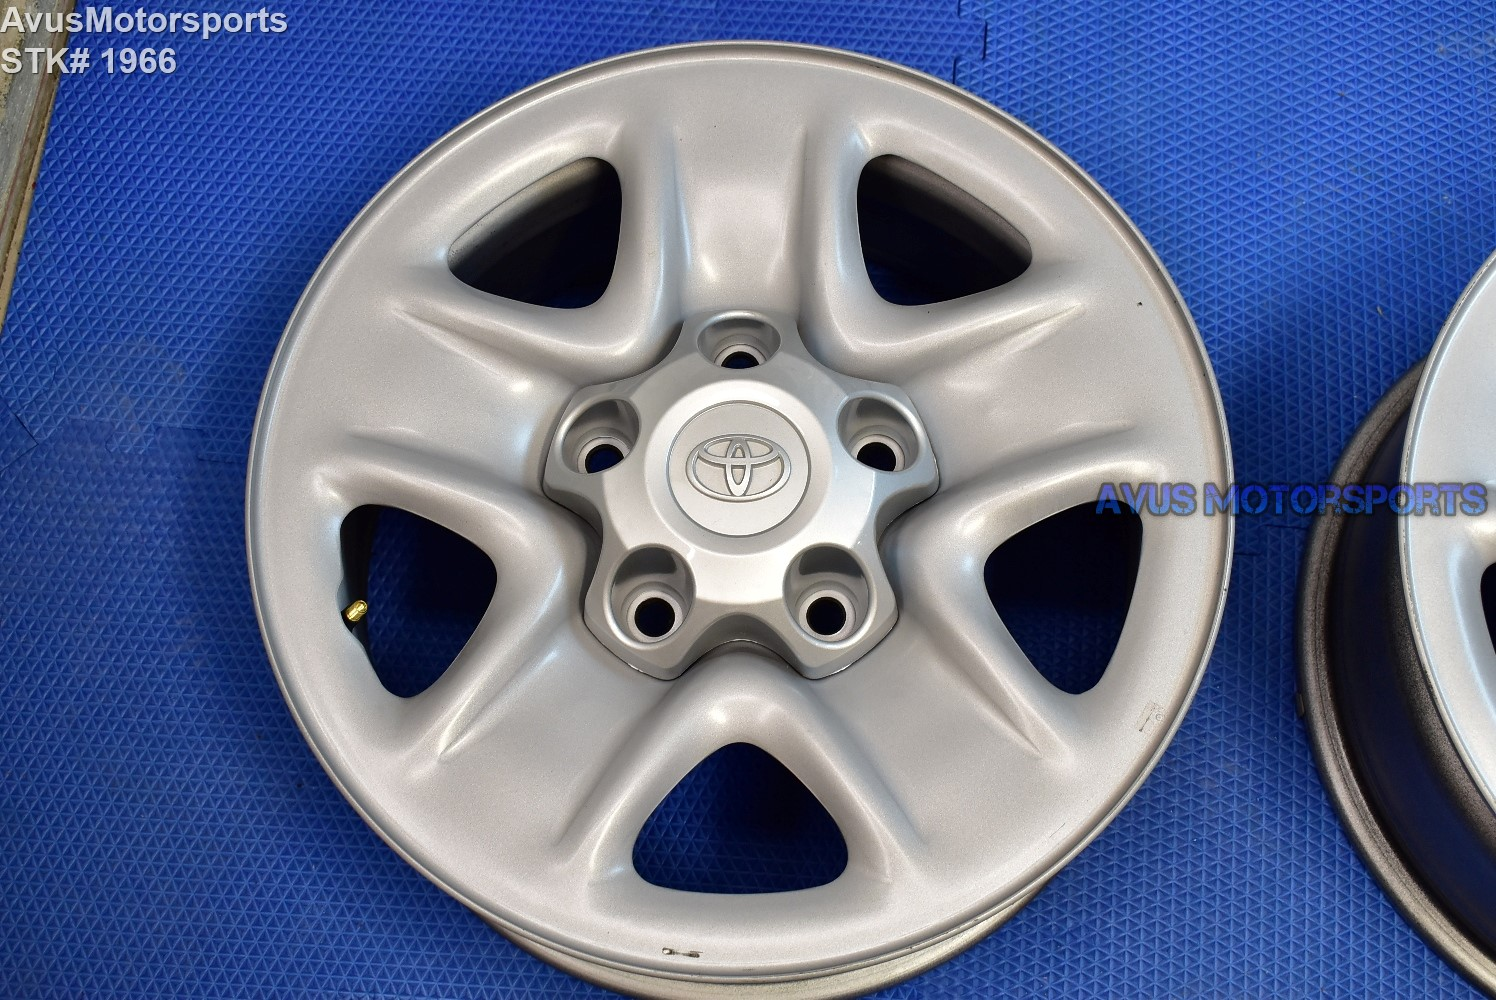 18 Quot Toyota Tundra Oem Factory Steel Wheels Sequoia Land Cruiser Lx570 2018 17